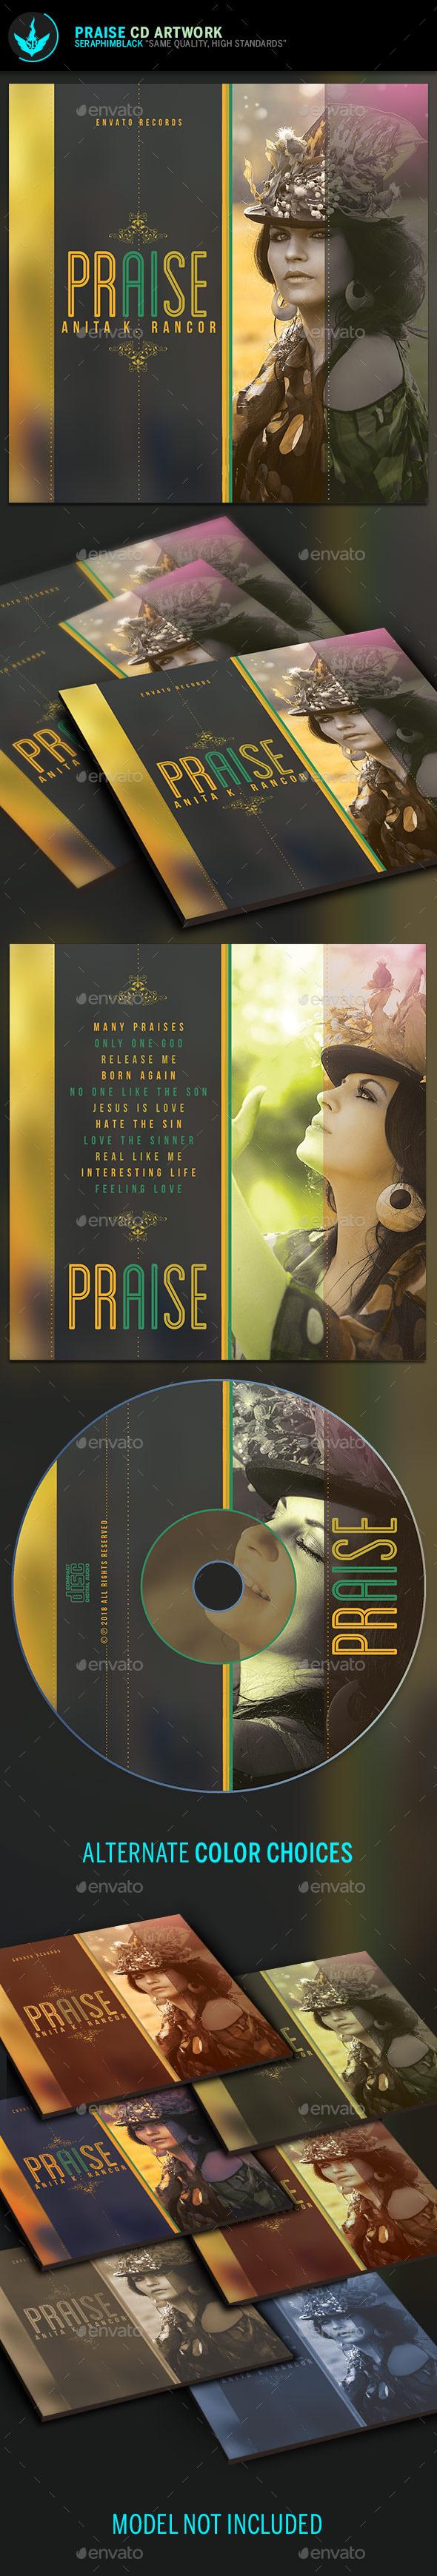 Praise and Prayer CD Artwork  Template - CD & DVD Artwork Print Templates